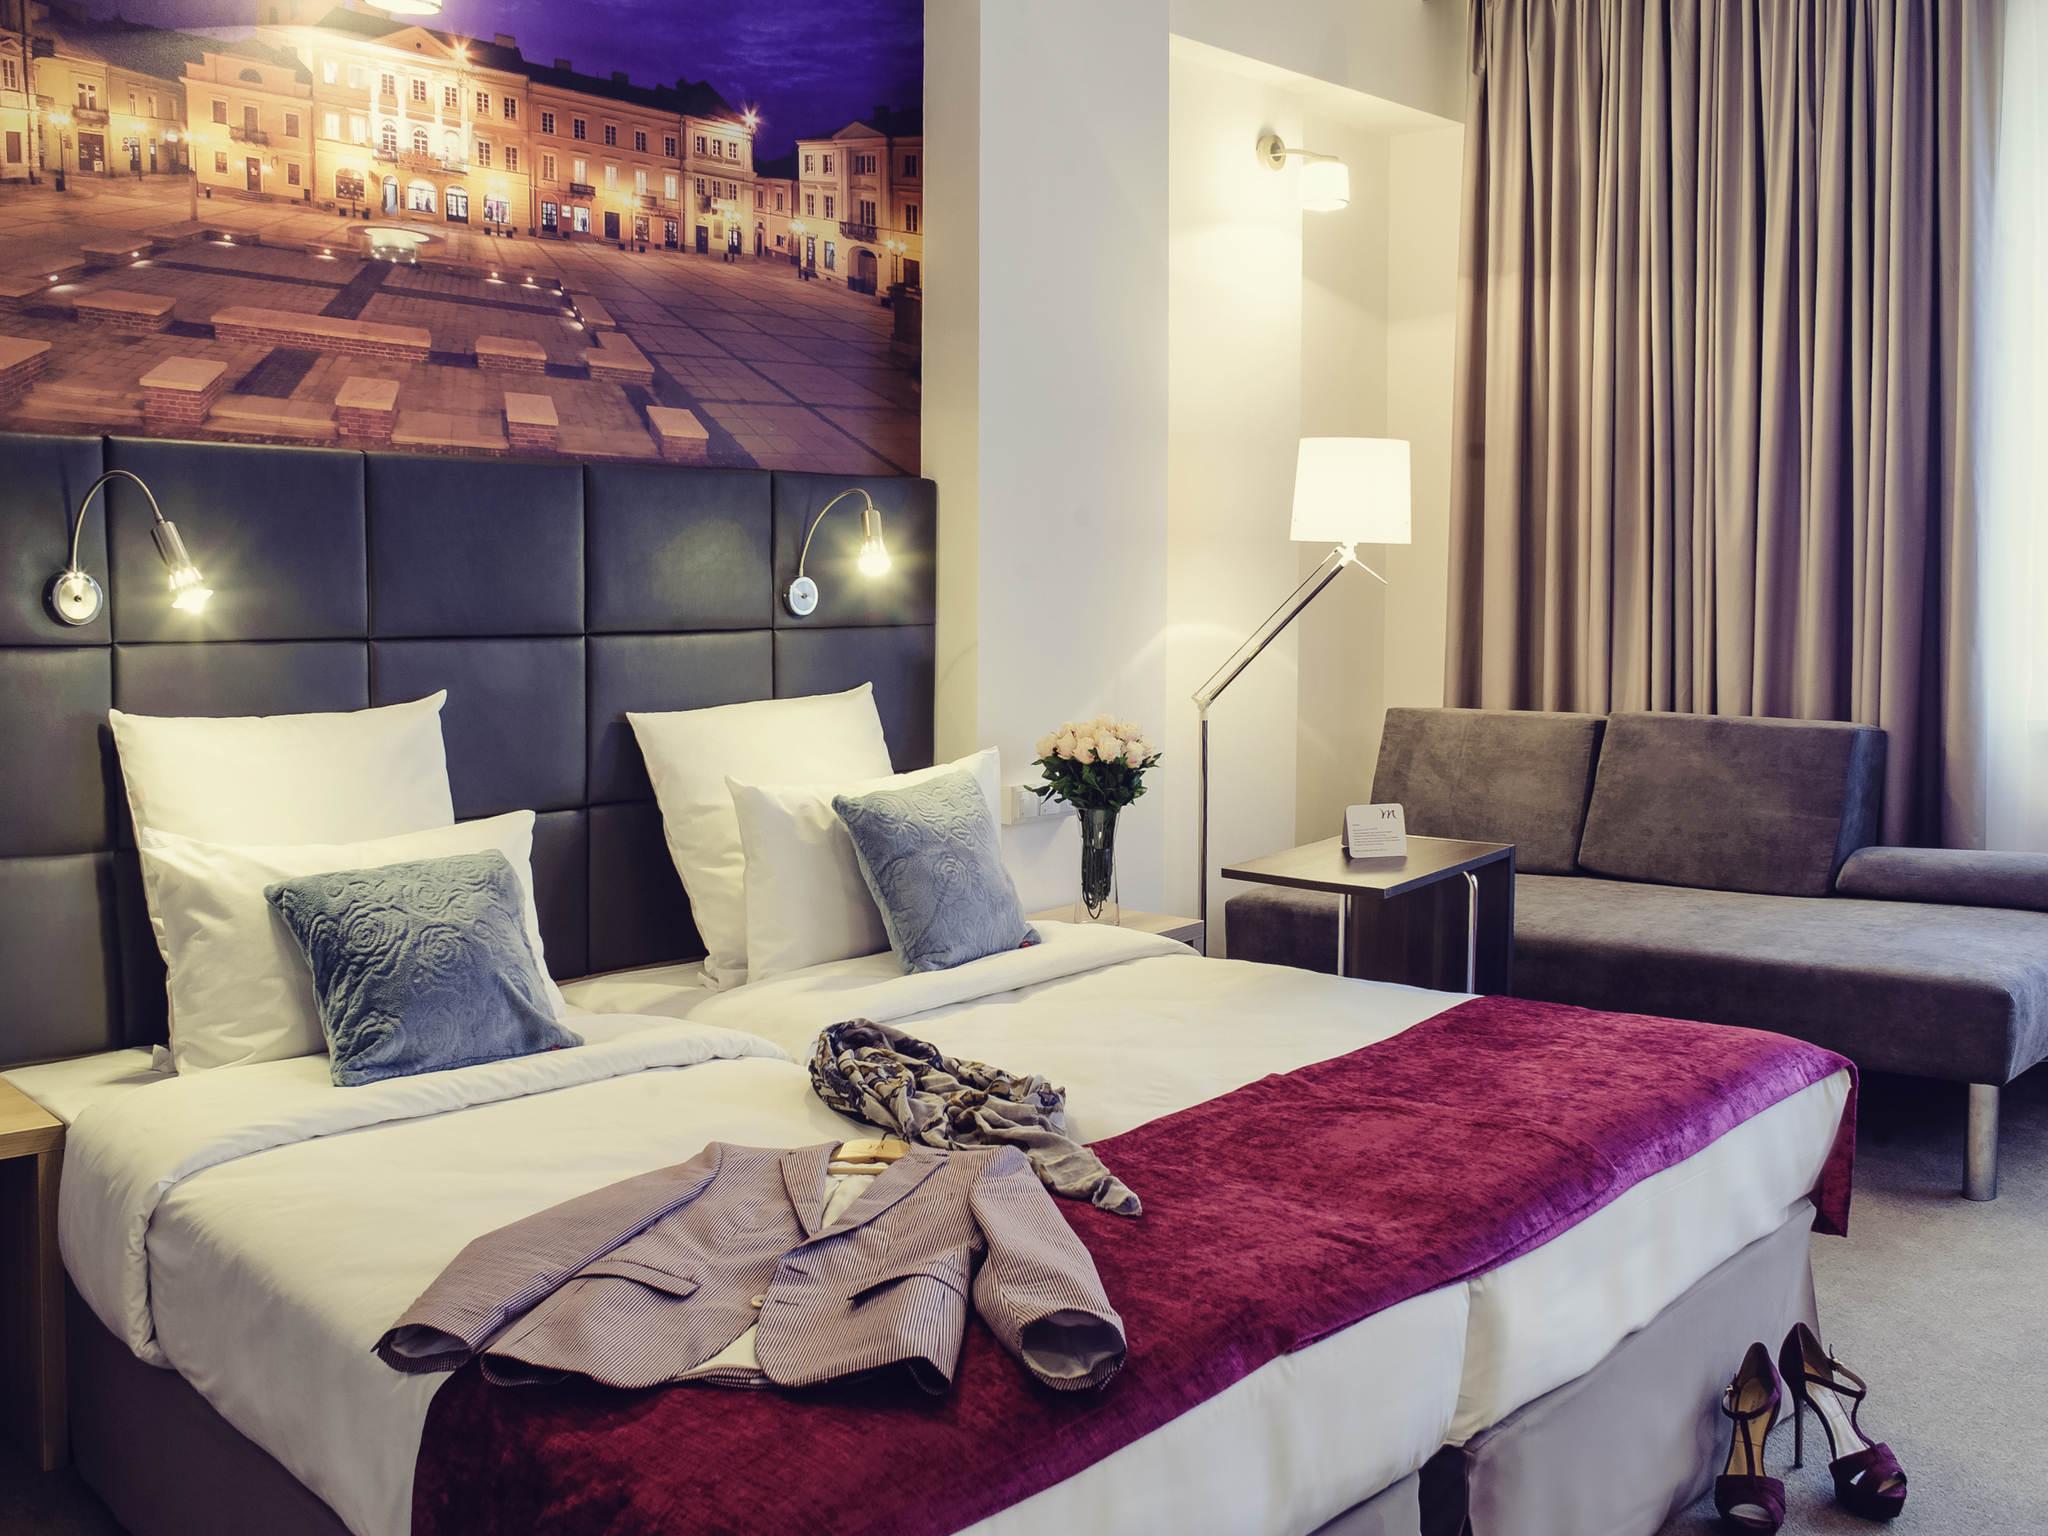 Hotel – Hotel Mercure Piotrkow Trybunalski Vestil